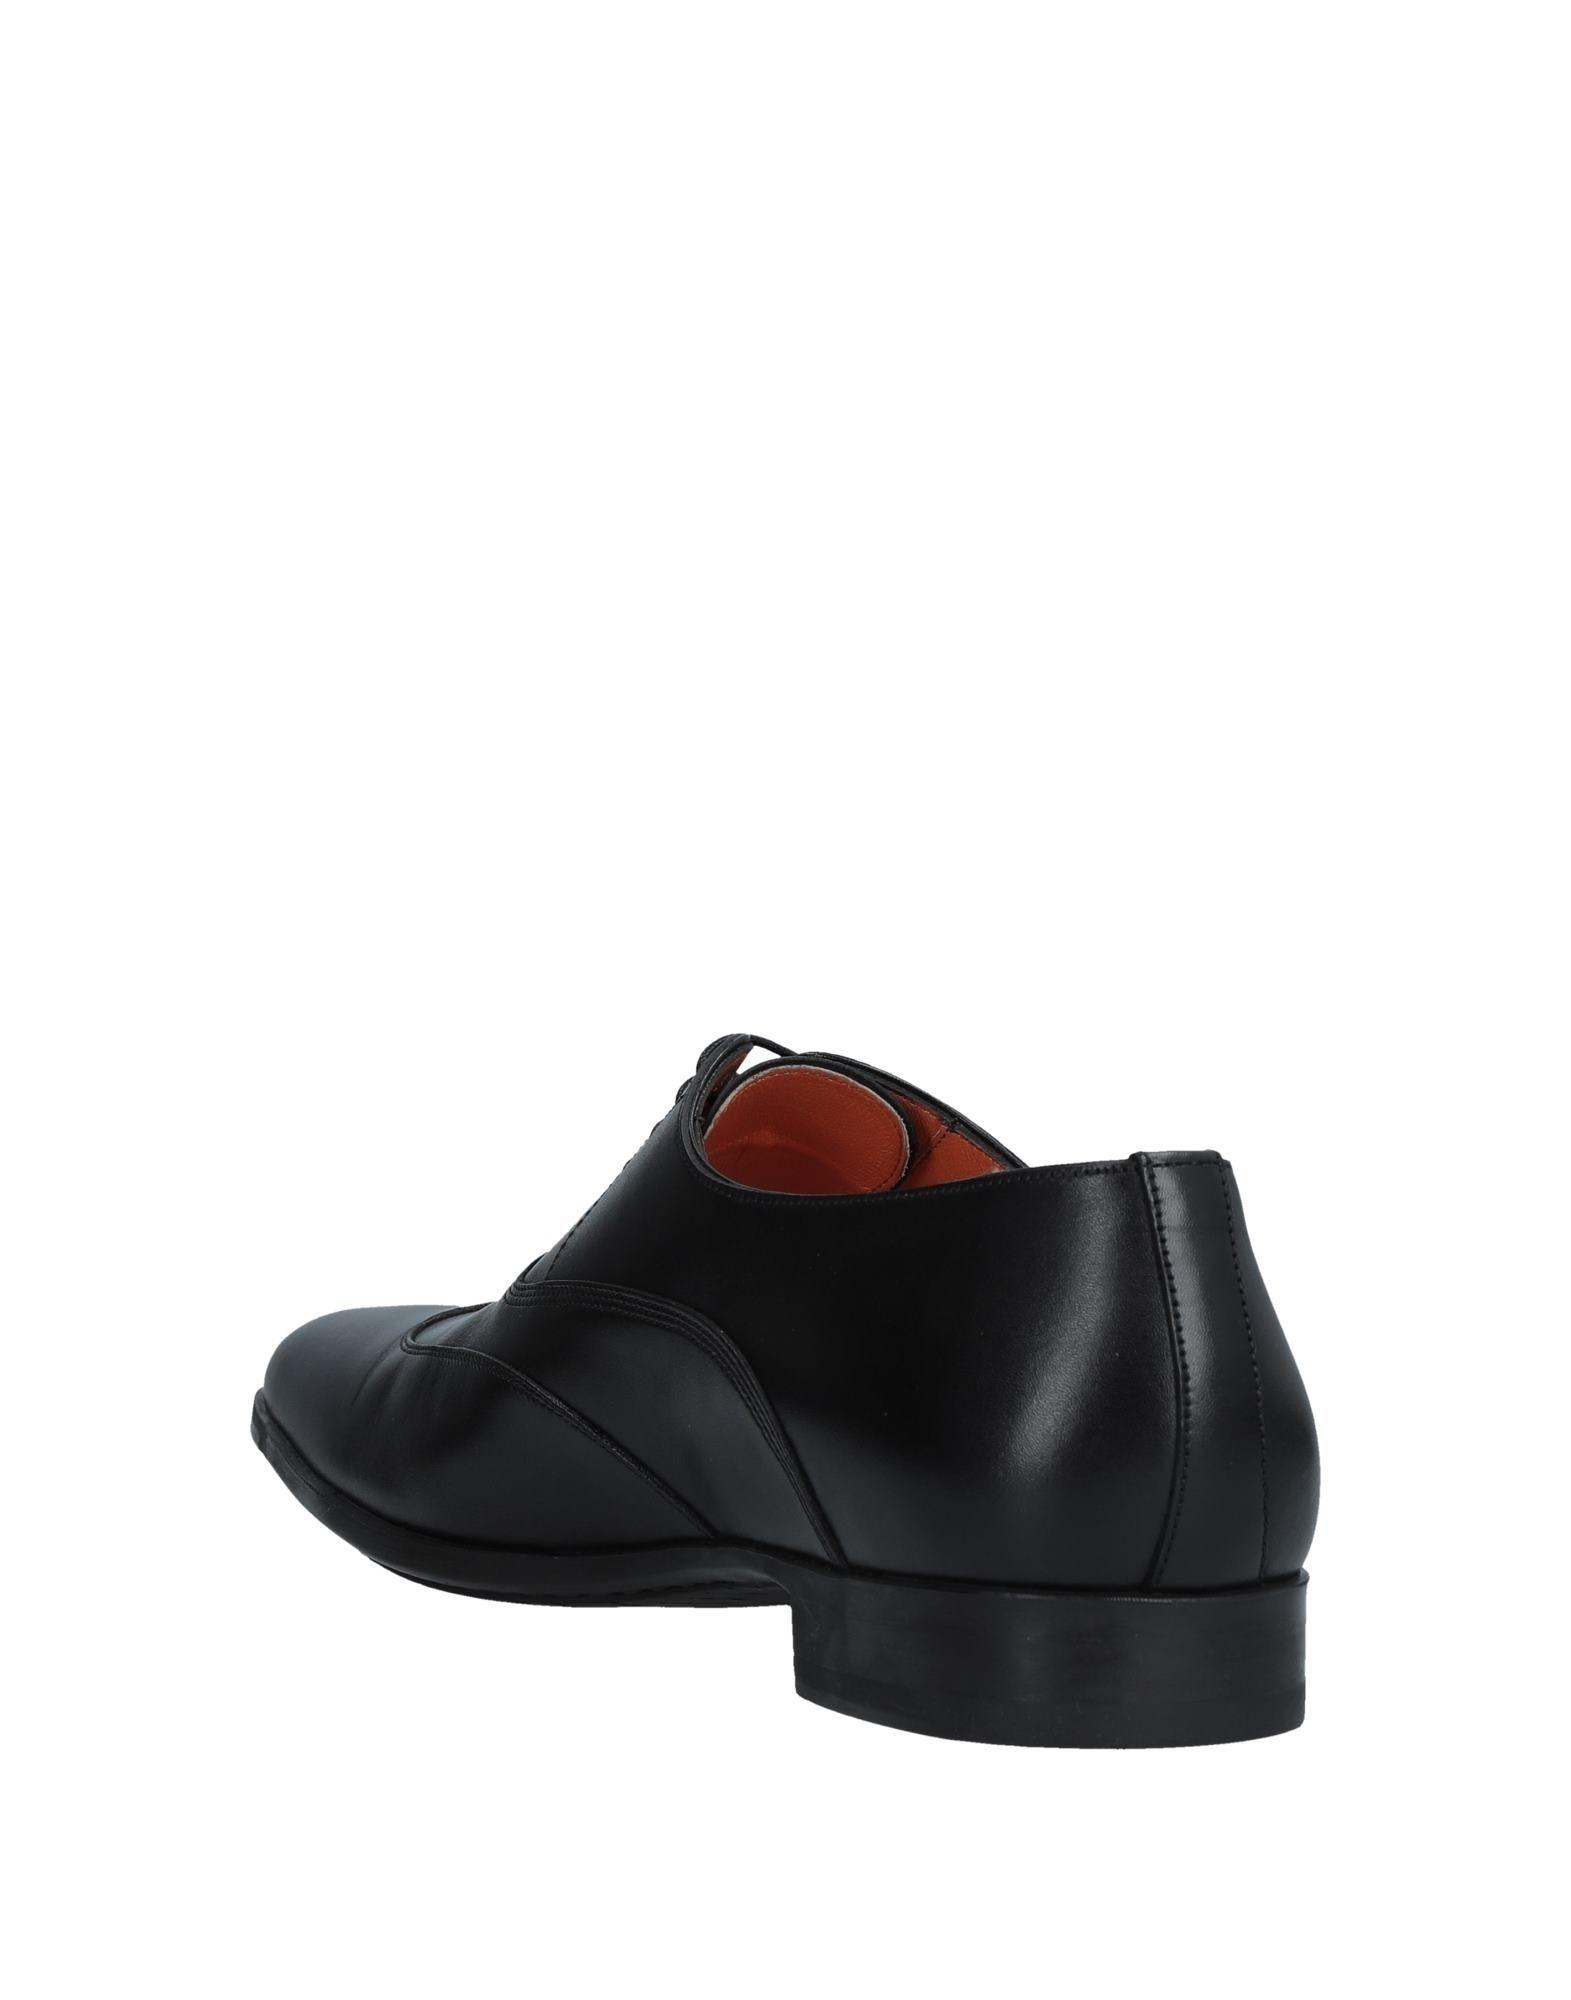 Santoni Schnürschuhe Qualität Herren  11542114II Gute Qualität Schnürschuhe beliebte Schuhe 8c5aac